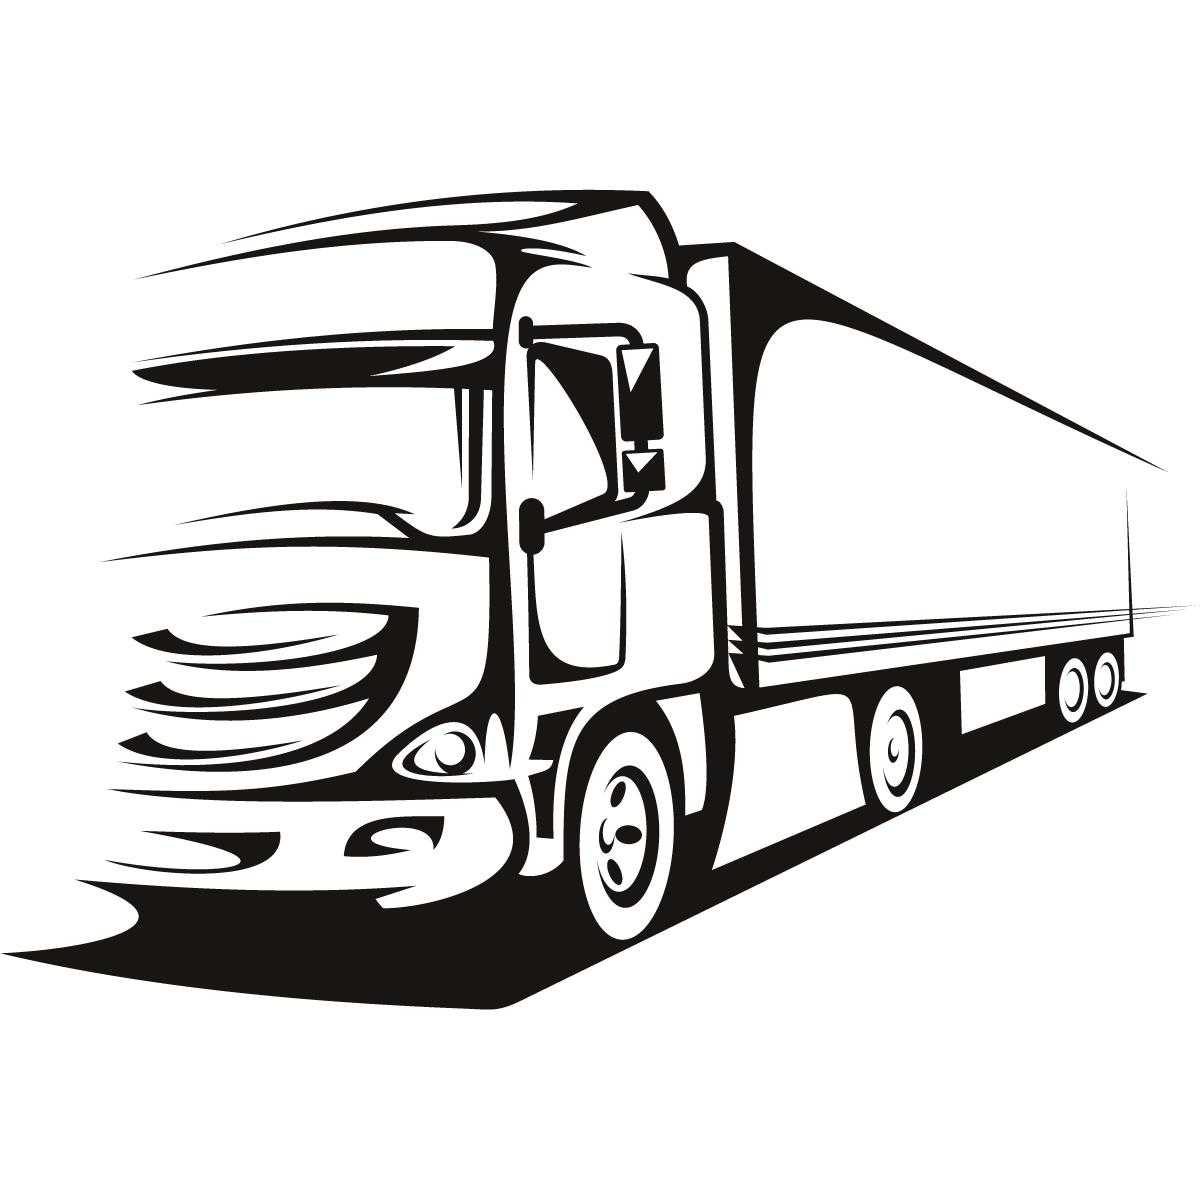 Lorry Wagon Truck Transport Wall Art Sticker Wall Decal